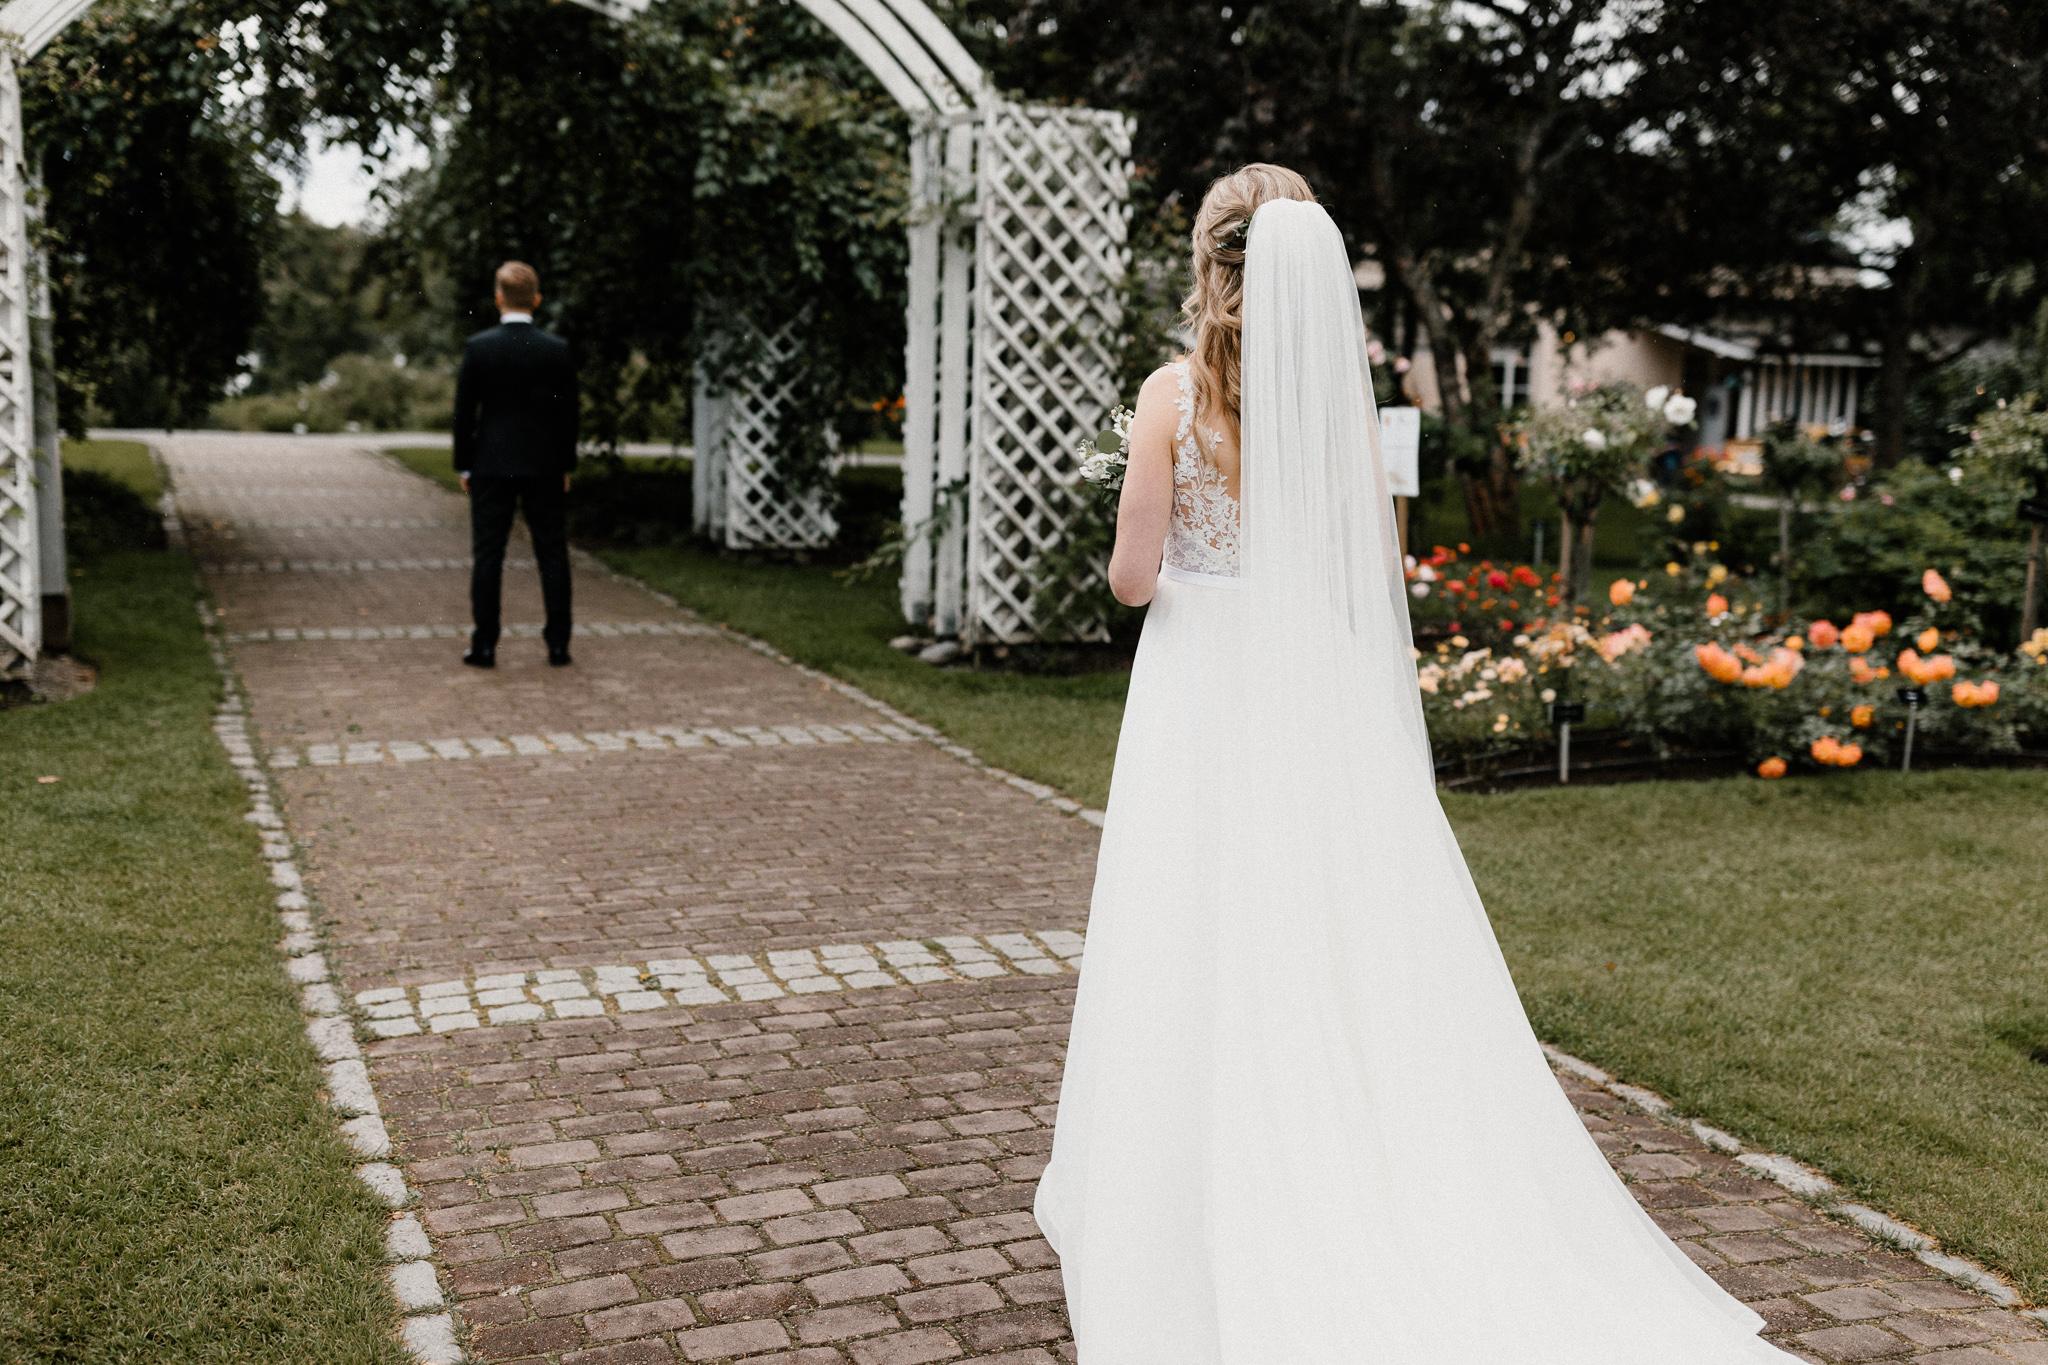 Johanna + Mikko - Tampere - Photo by Patrick Karkkolainen Wedding Photographer-16.jpg